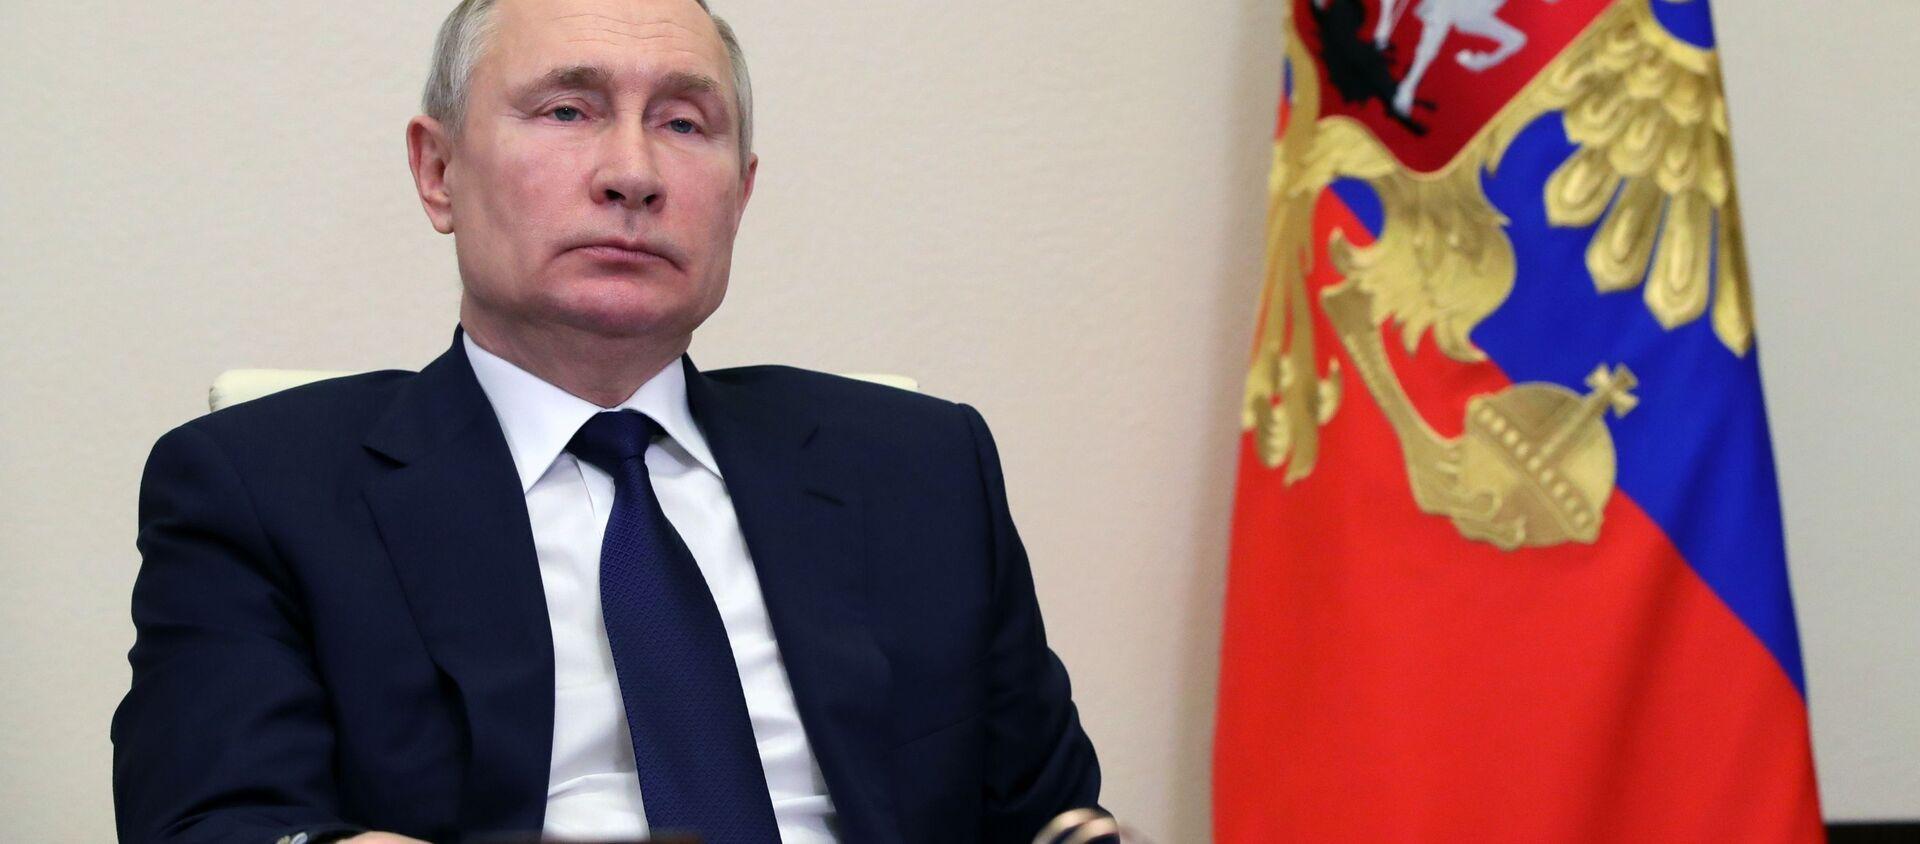 Tổng thống Nga Vladimir Putin. - Sputnik Việt Nam, 1920, 22.03.2021